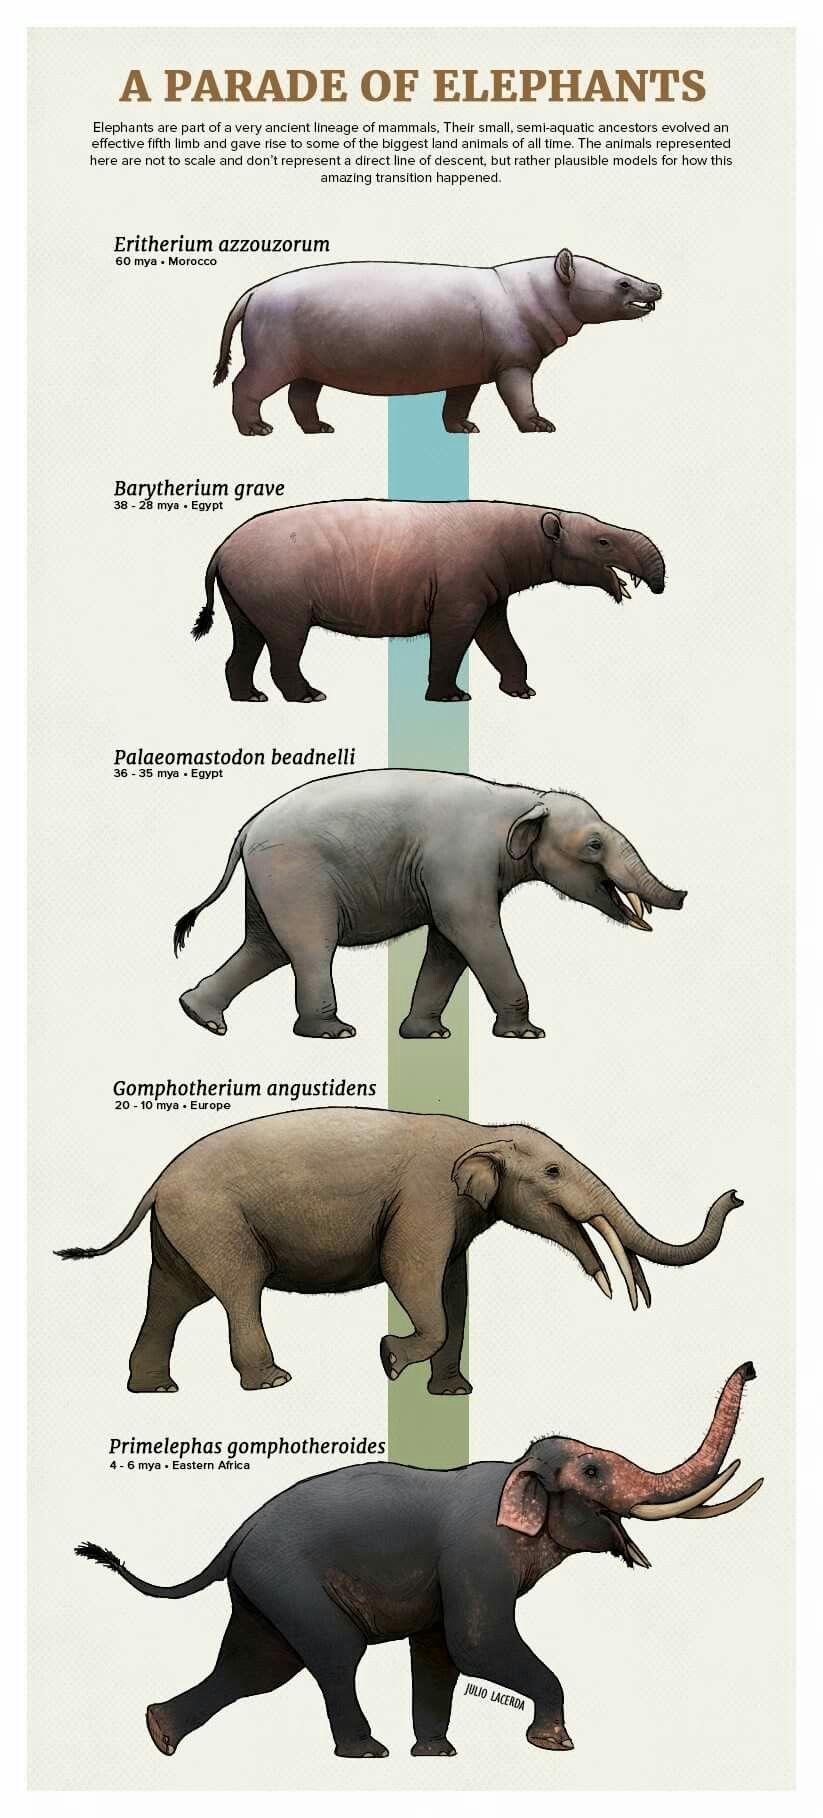 Image of: Scary Exemplo De Elefantes Do Continente Prehistoric World Prehistoric Creatures Prehistoric Wildlife Extinct Pinterest Exemplo De Elefantes Do Continente Extinct Creatures Pinterest